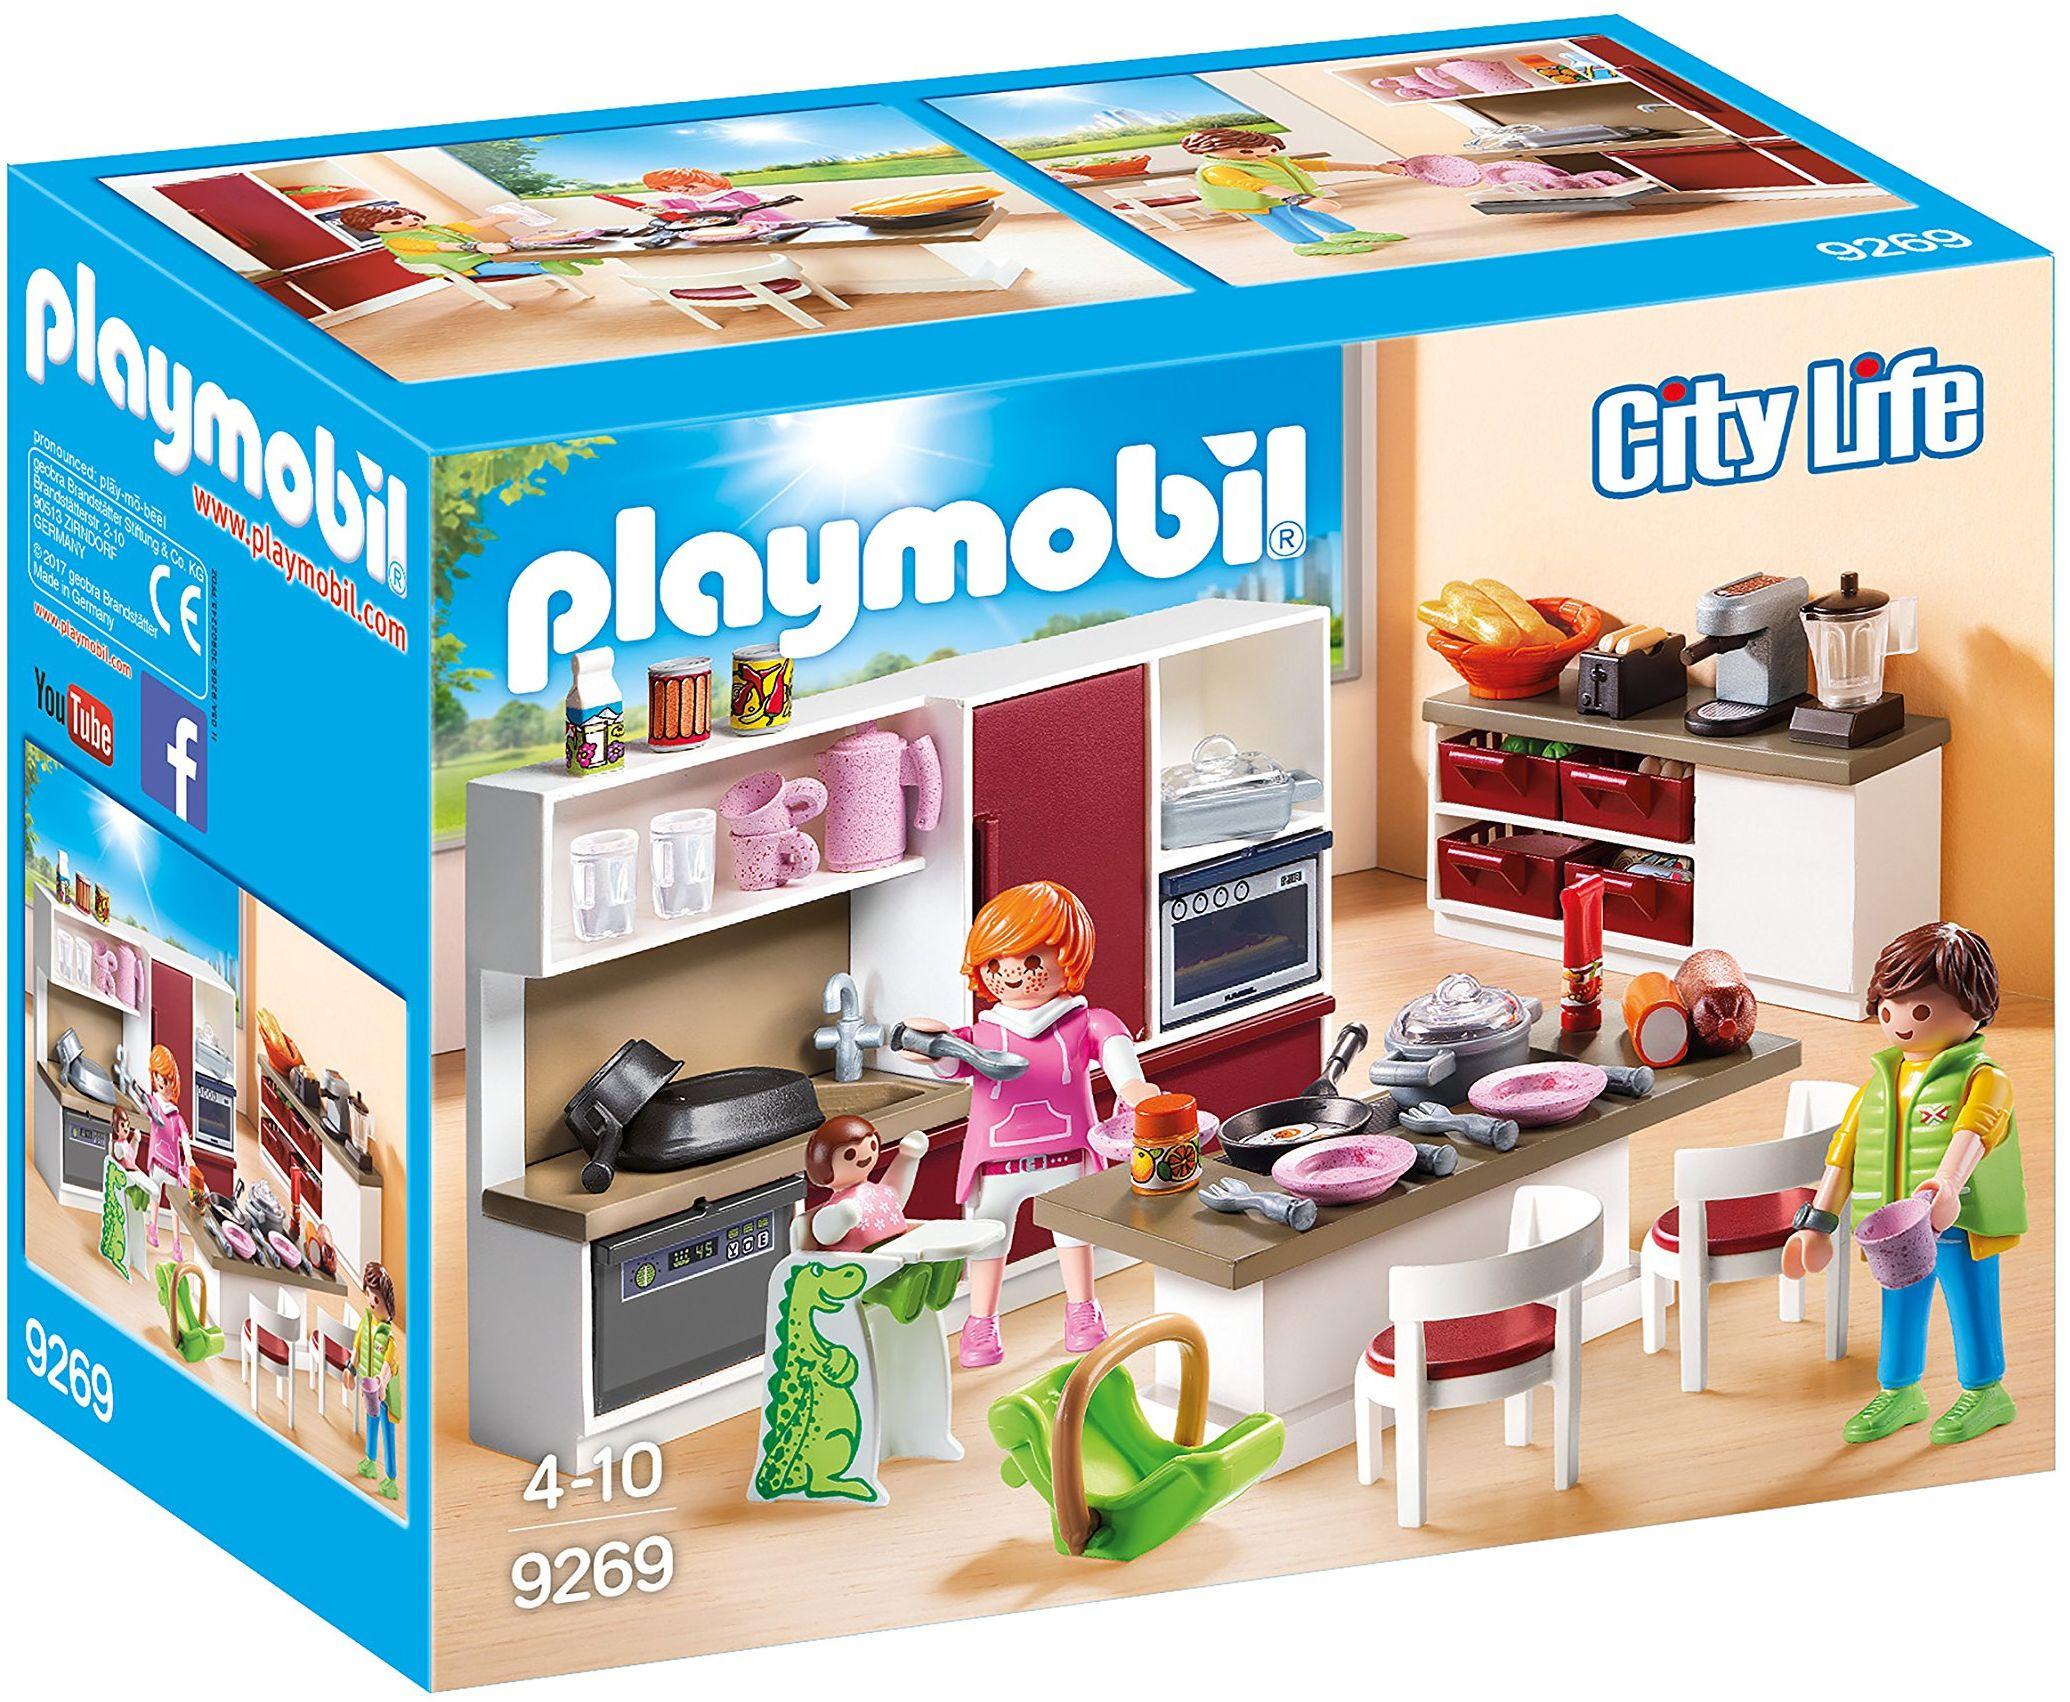 PLAYMOBIL City Life 9269 Duża rodzinna kuchnia, od 4 lat